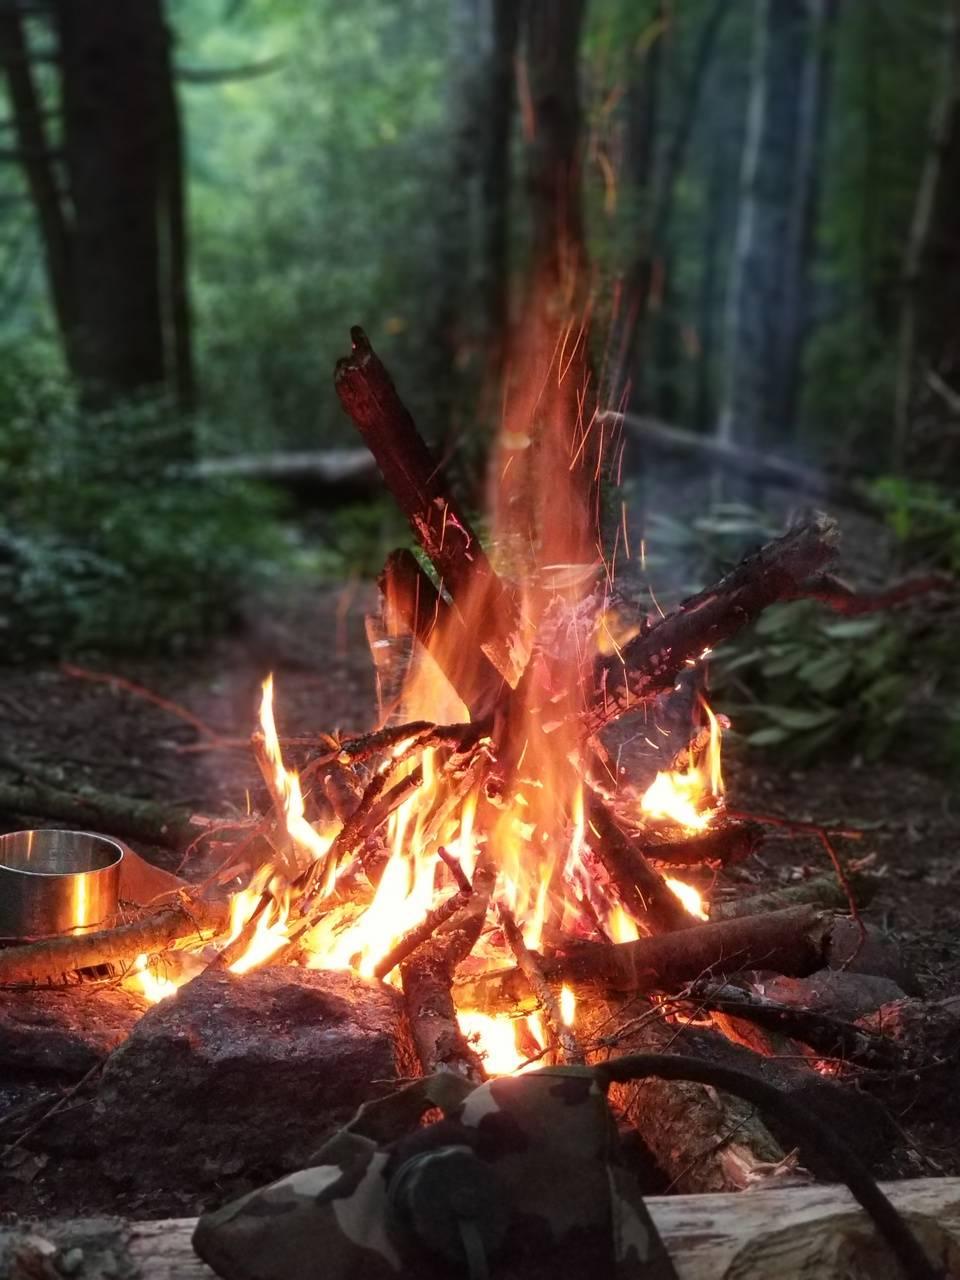 Hiking campfire